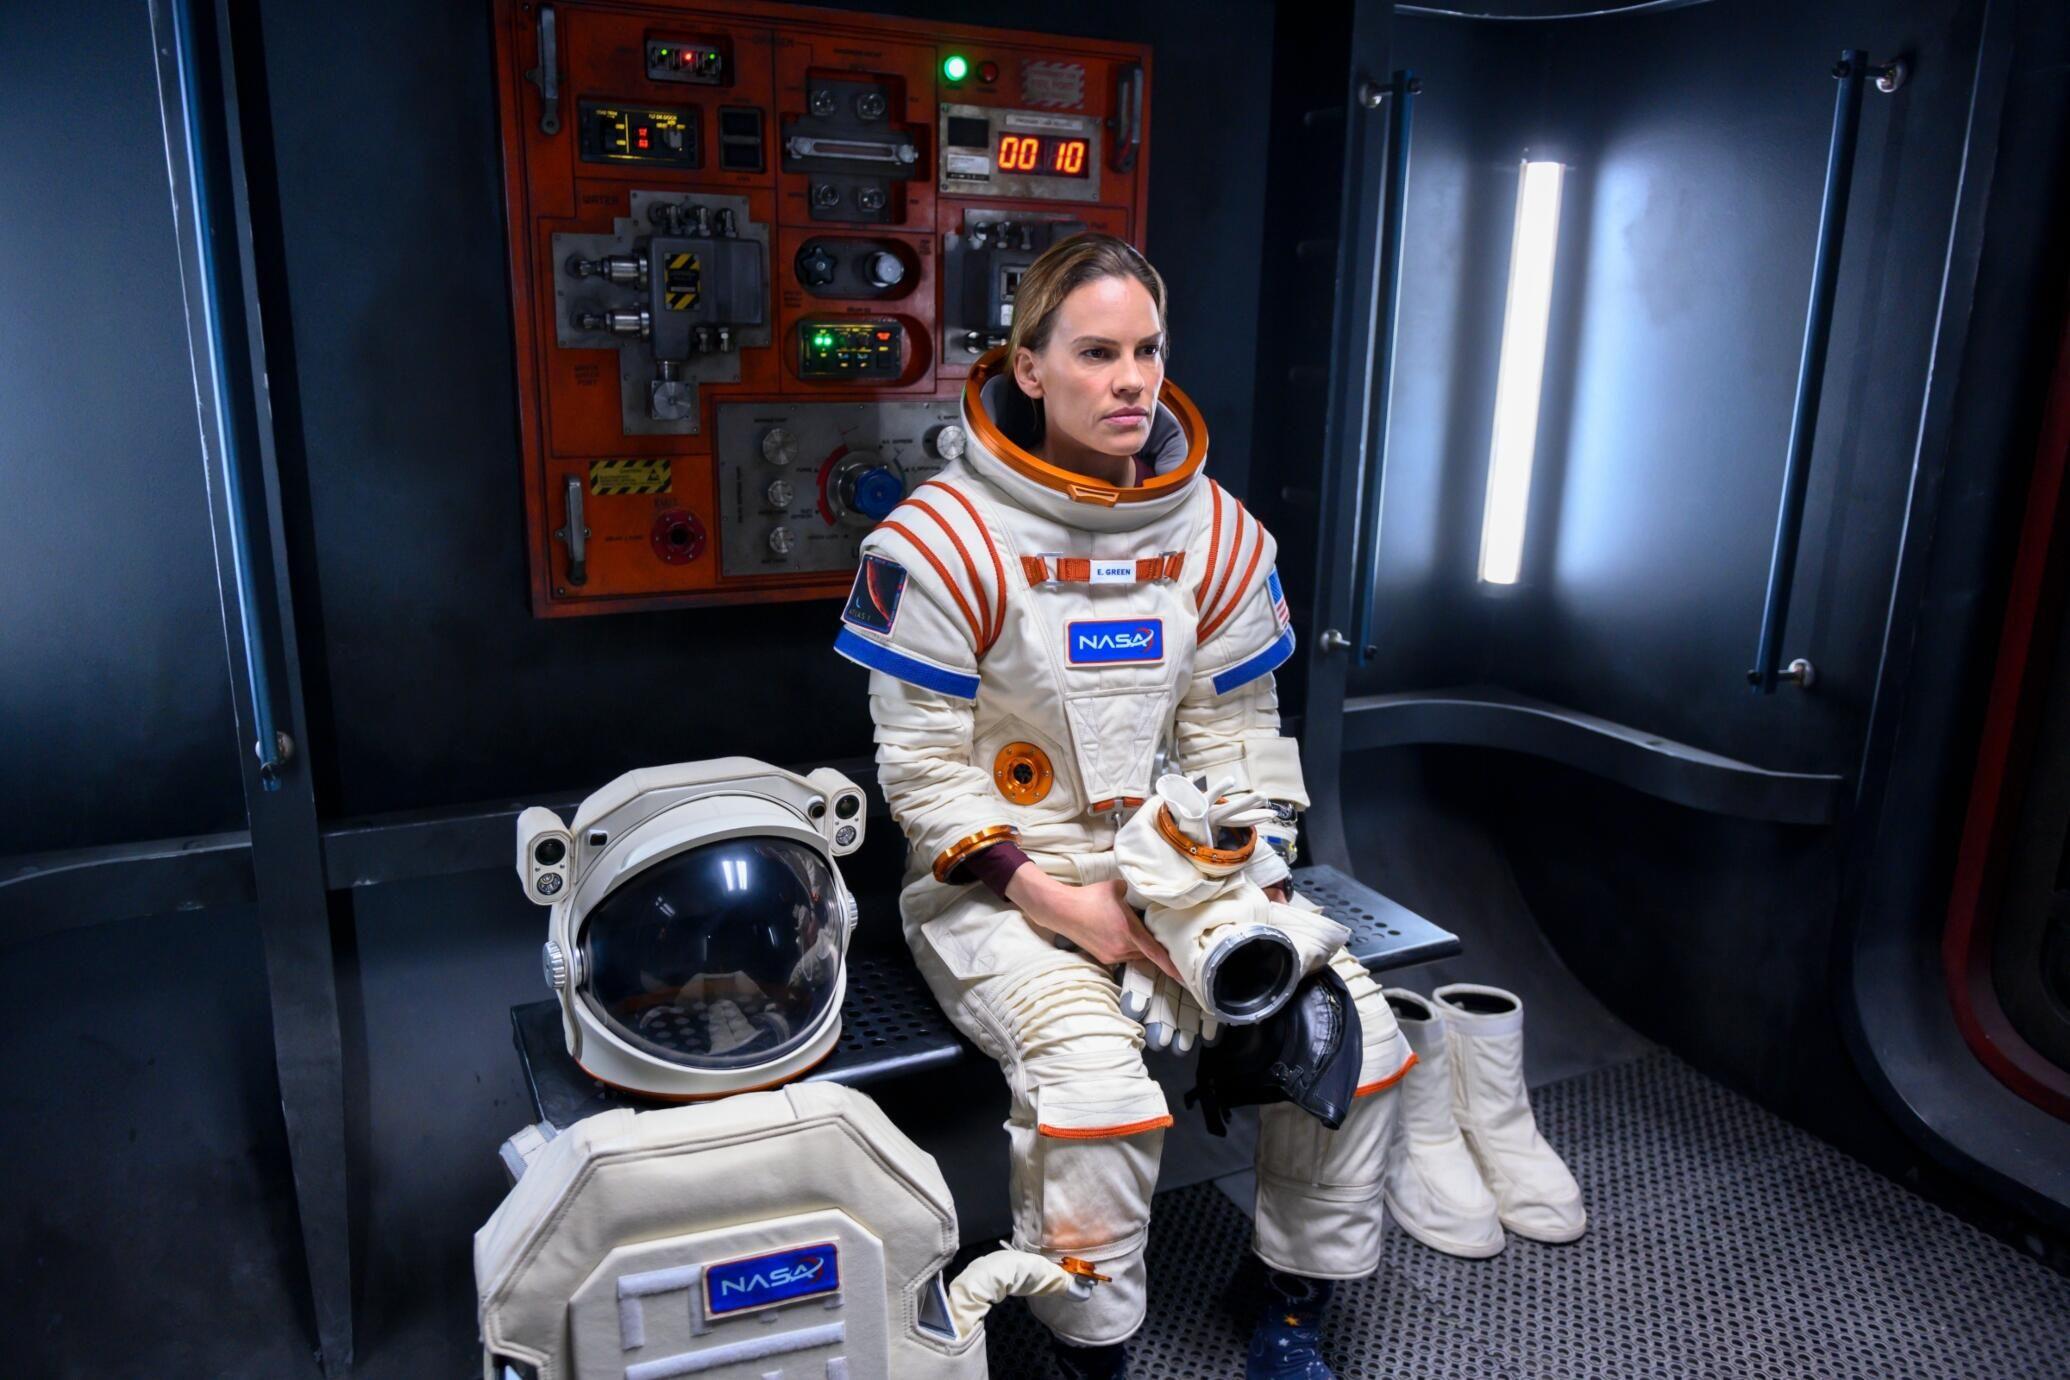 Hilary Swank Leads A Bittersweet Mission To Mars In Netflix S Away Teaser Tv Guide In 2020 Swank Netflix Netflix Releases